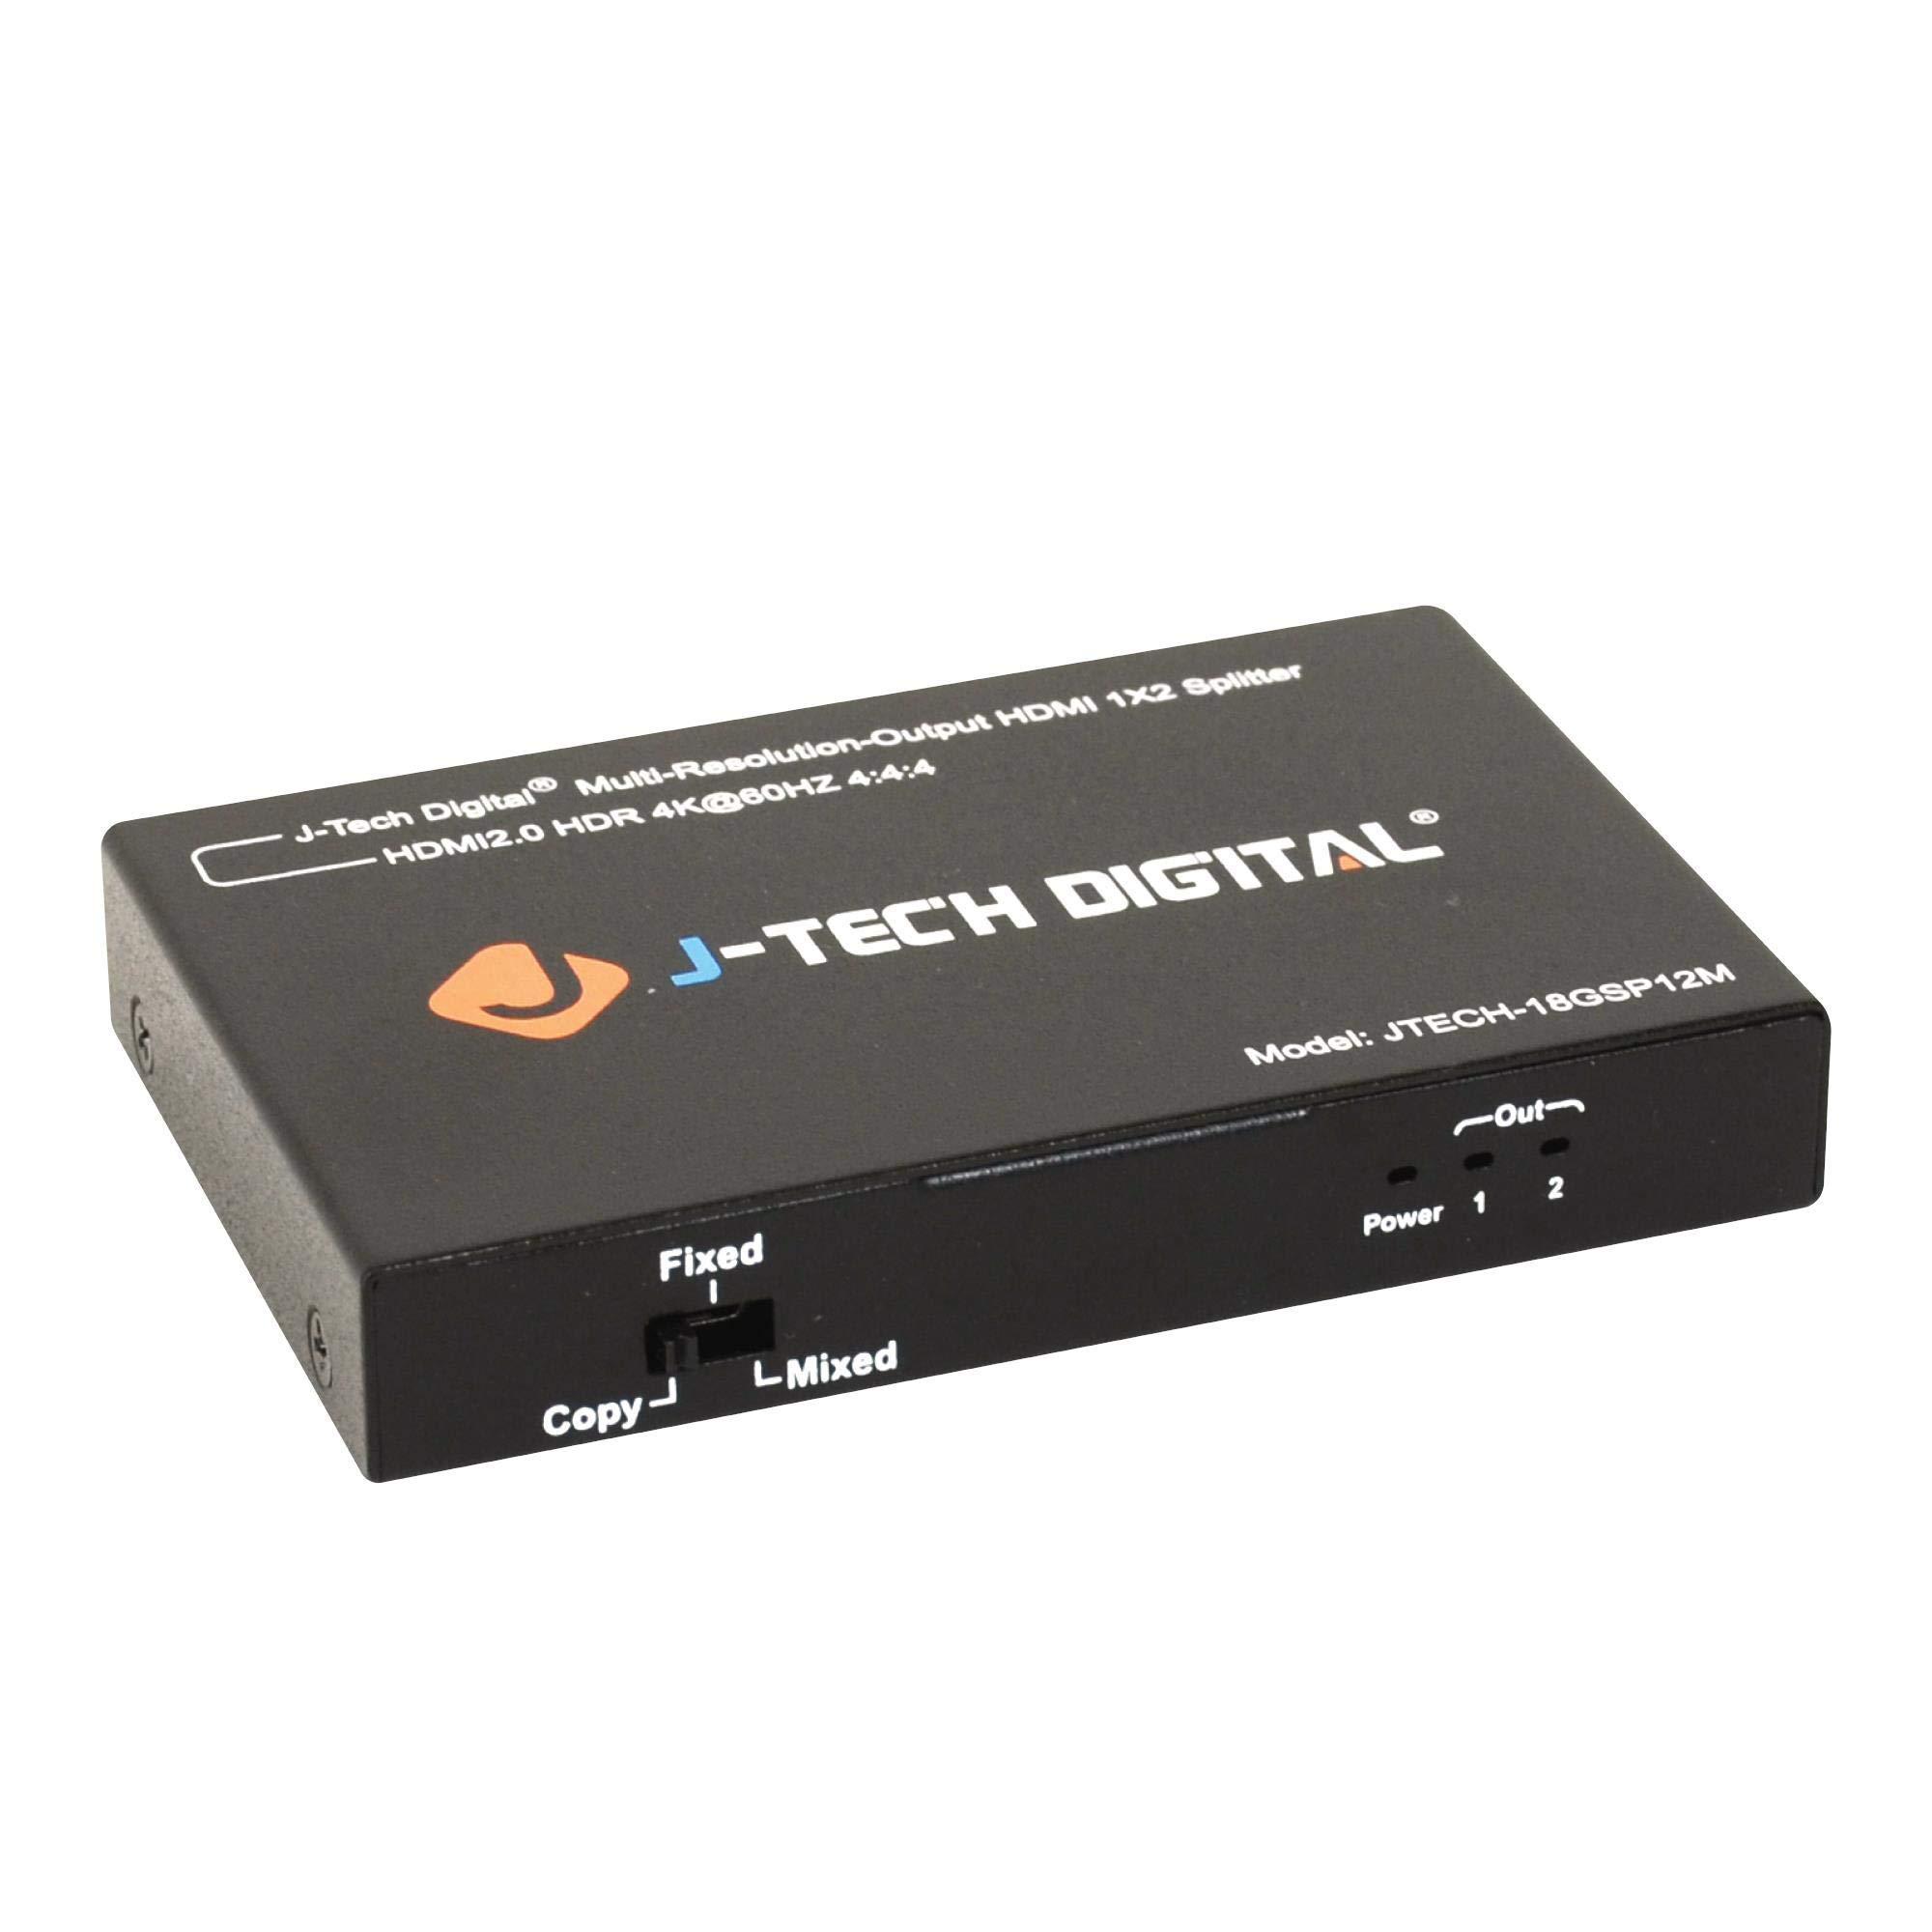 J-Tech Digital Scaler/Multi-Resolution Output (MRO) 18GBps 1x2 HDMI 2.0 Splitter HDR10/Dolby Vision 4K@60Hz 4:4:4 [JTECH-18GSP12M] by J-Tech Digital